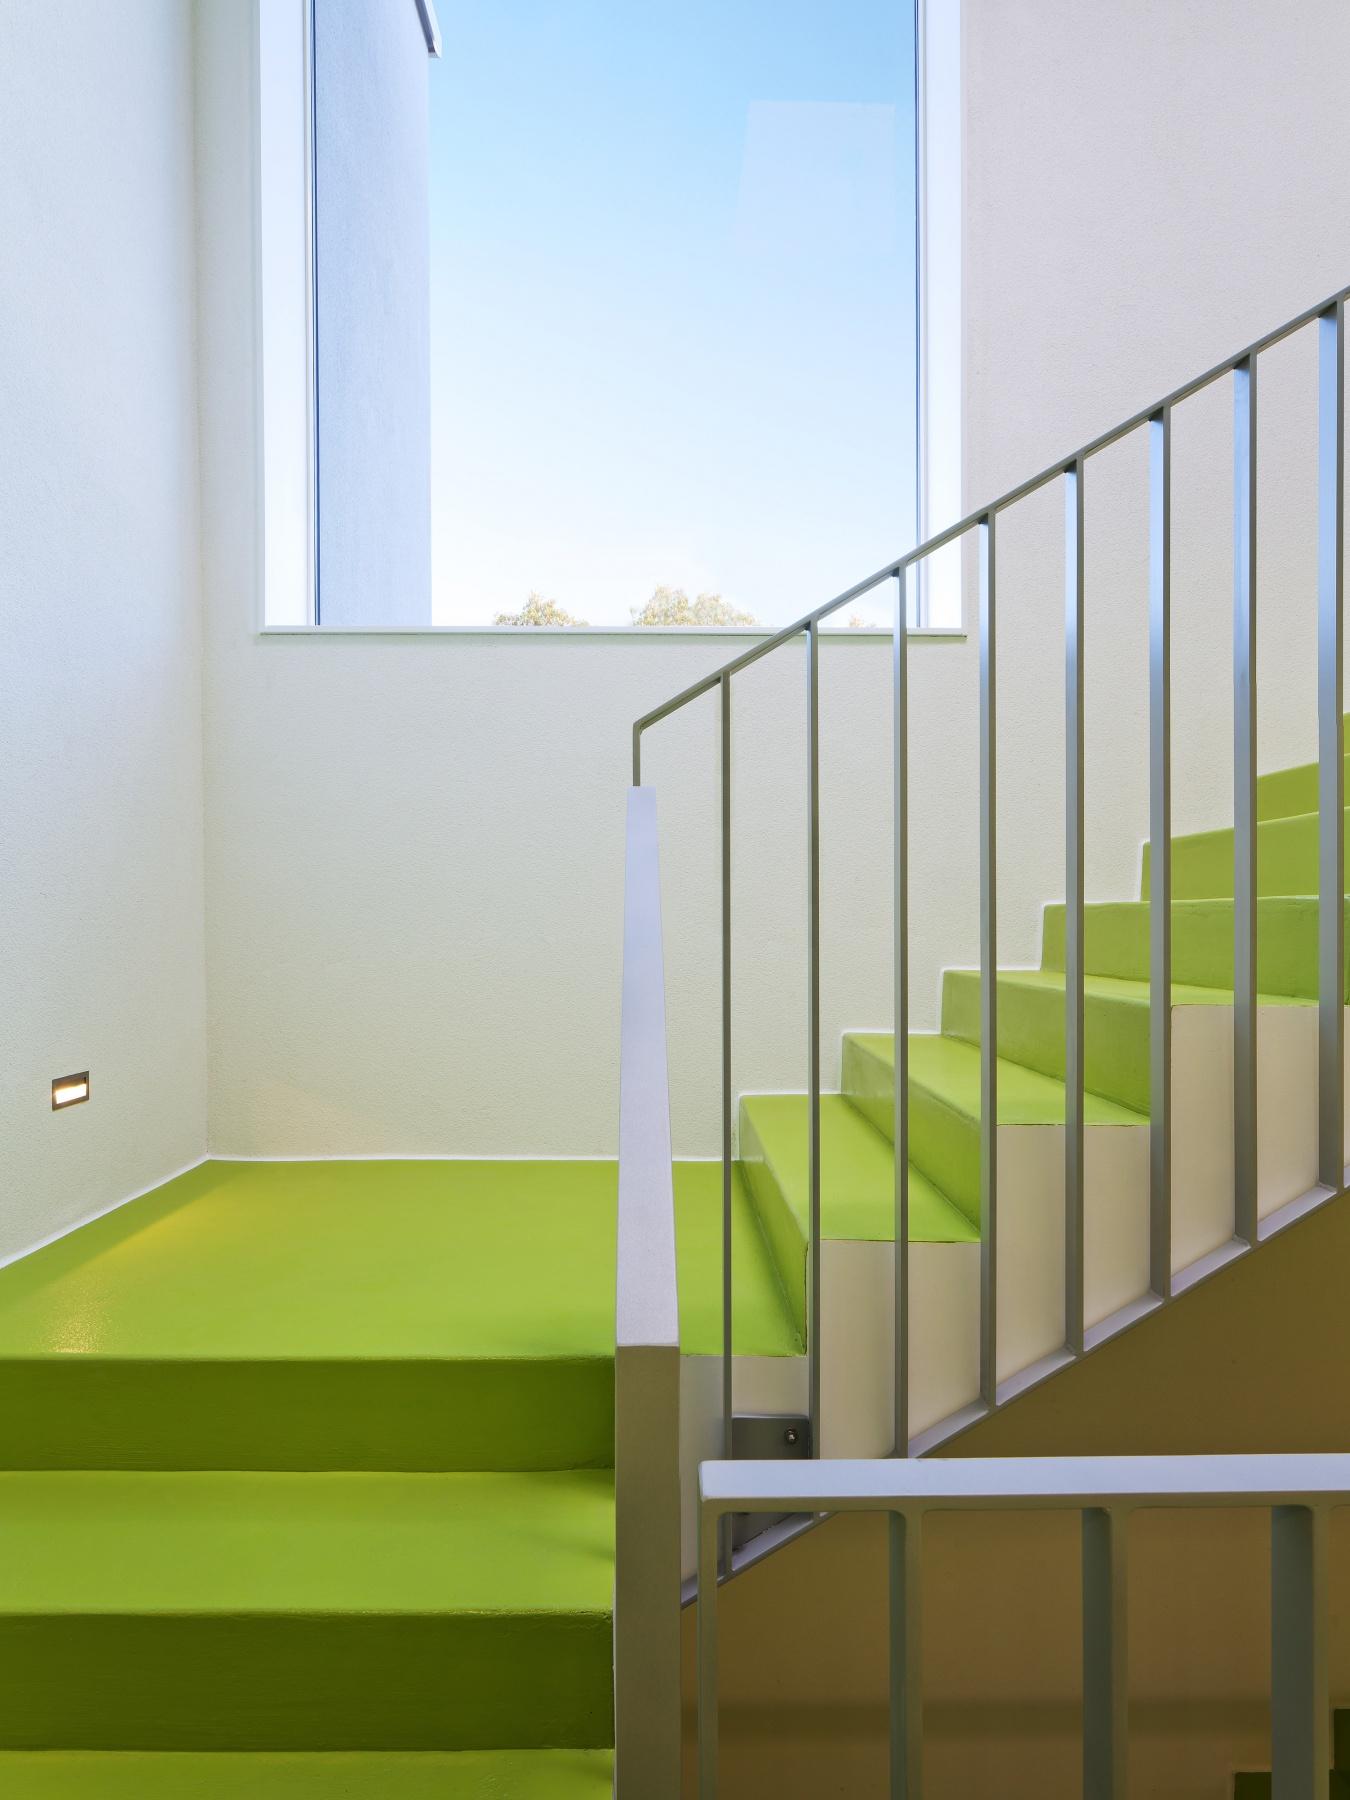 Recent comments for Fenster treppenhaus